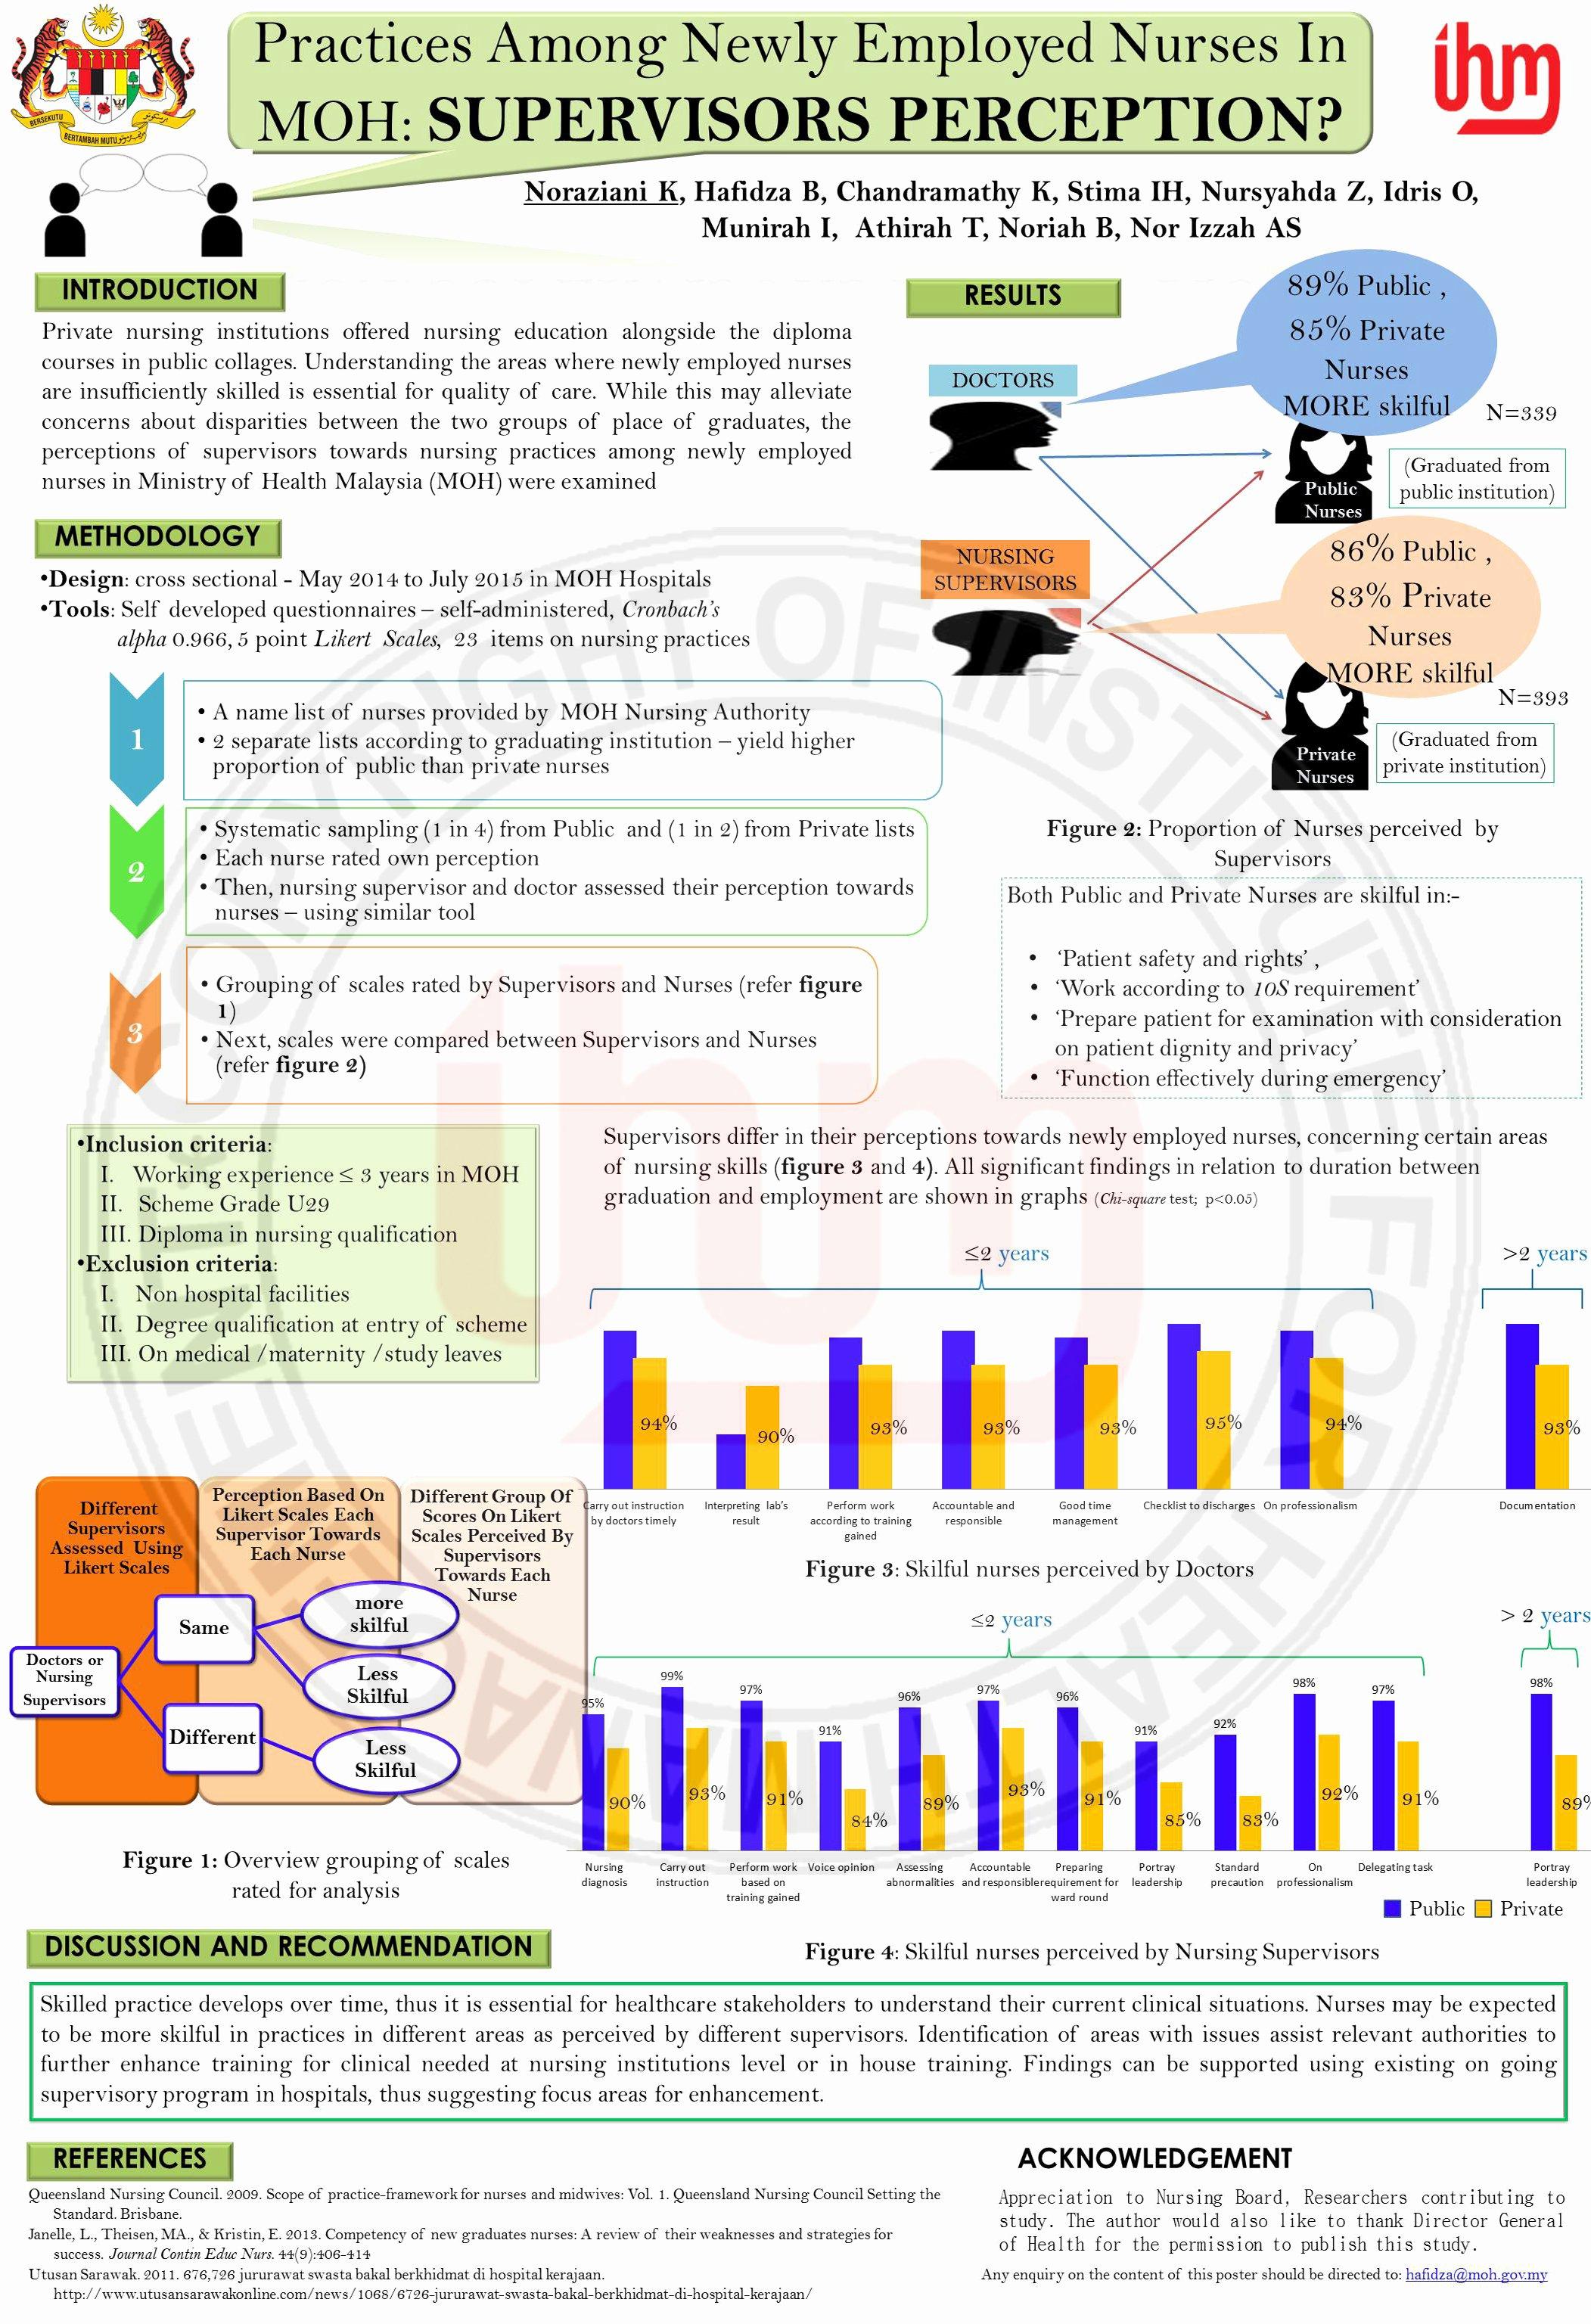 Nursing Poster Presentation Template Fresh Poster Presentation